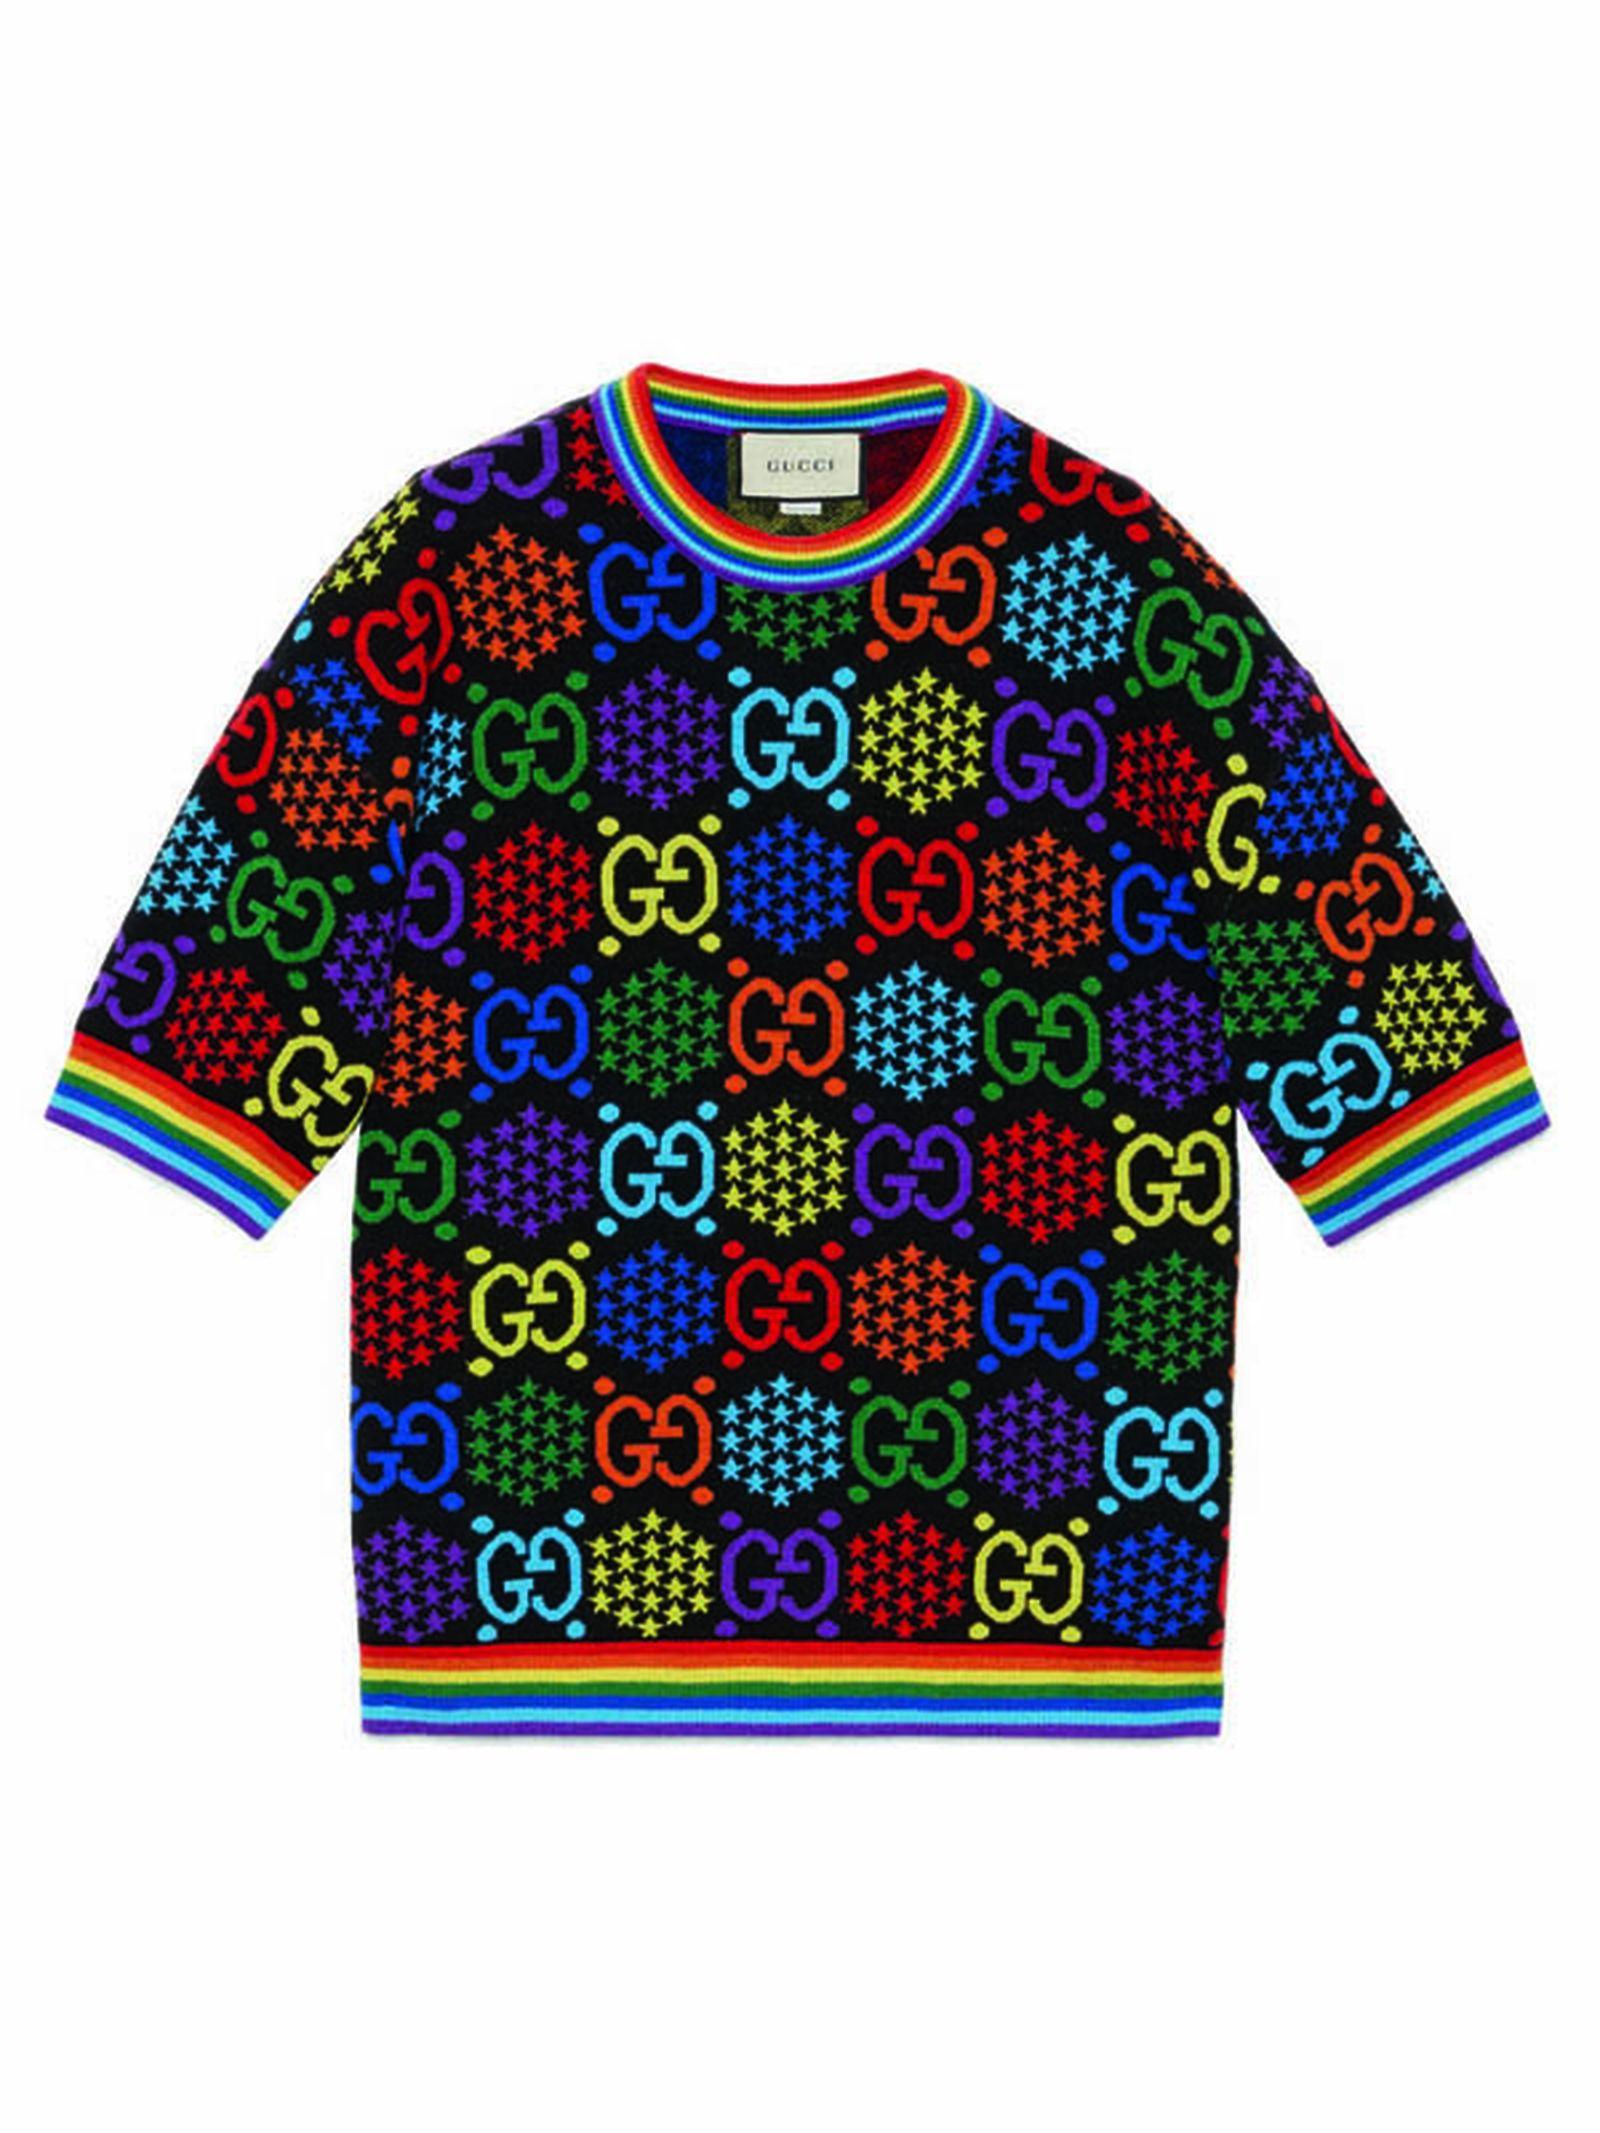 37gucci-psychedelics-pop-up